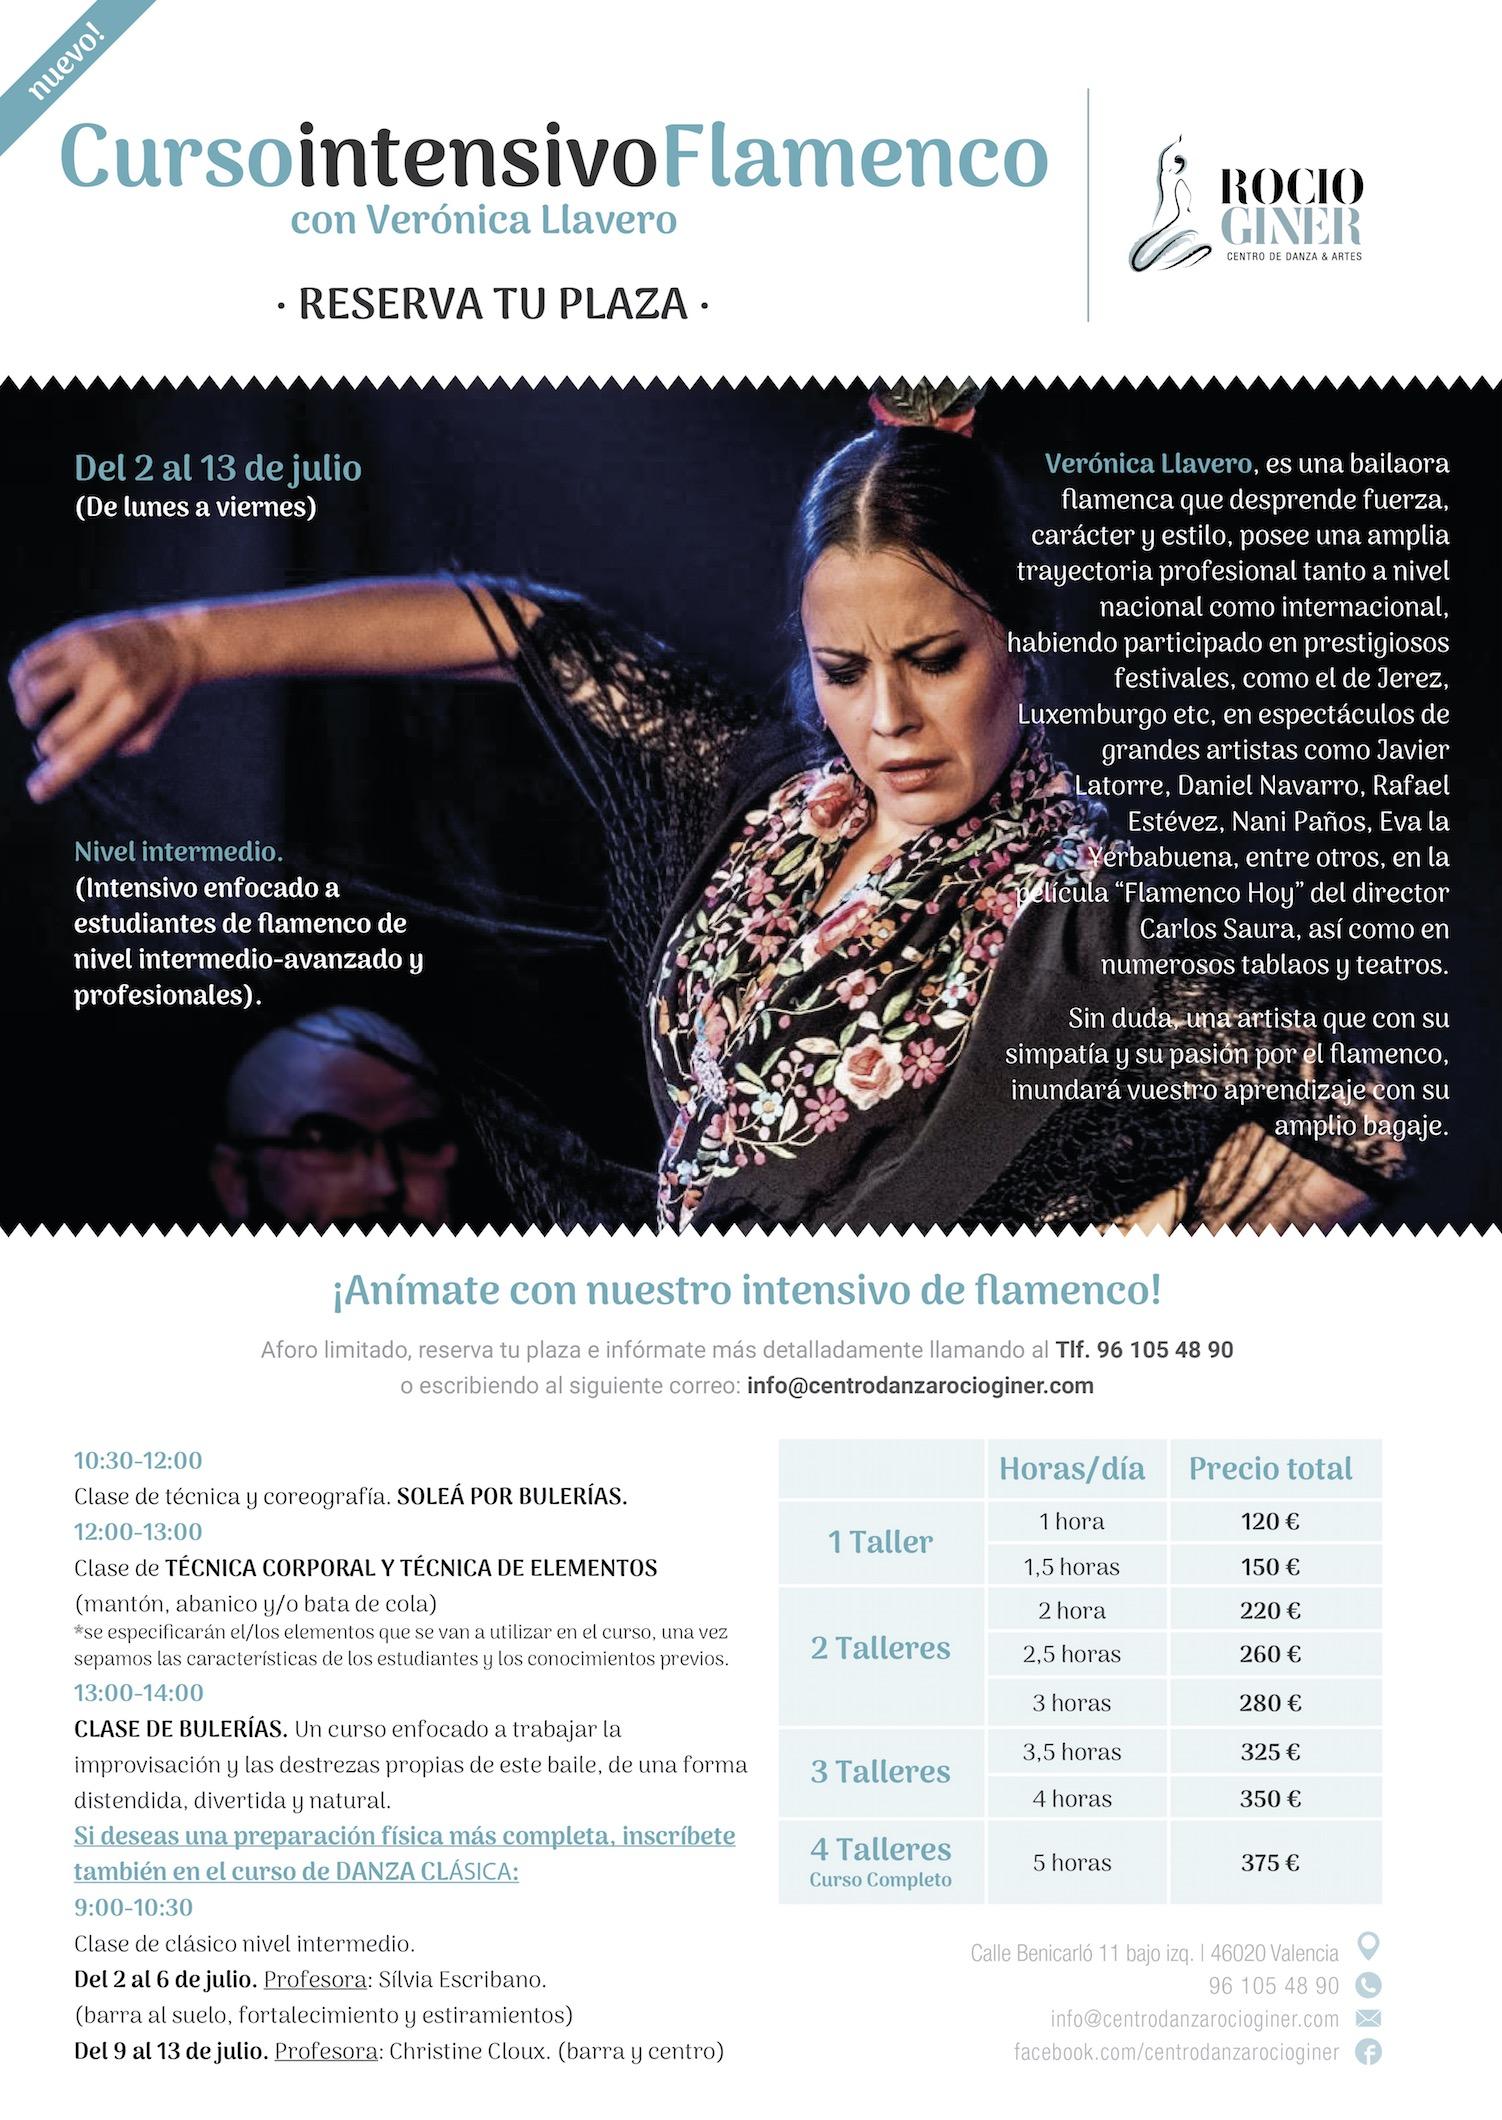 curso intensivo flamenco Valencia